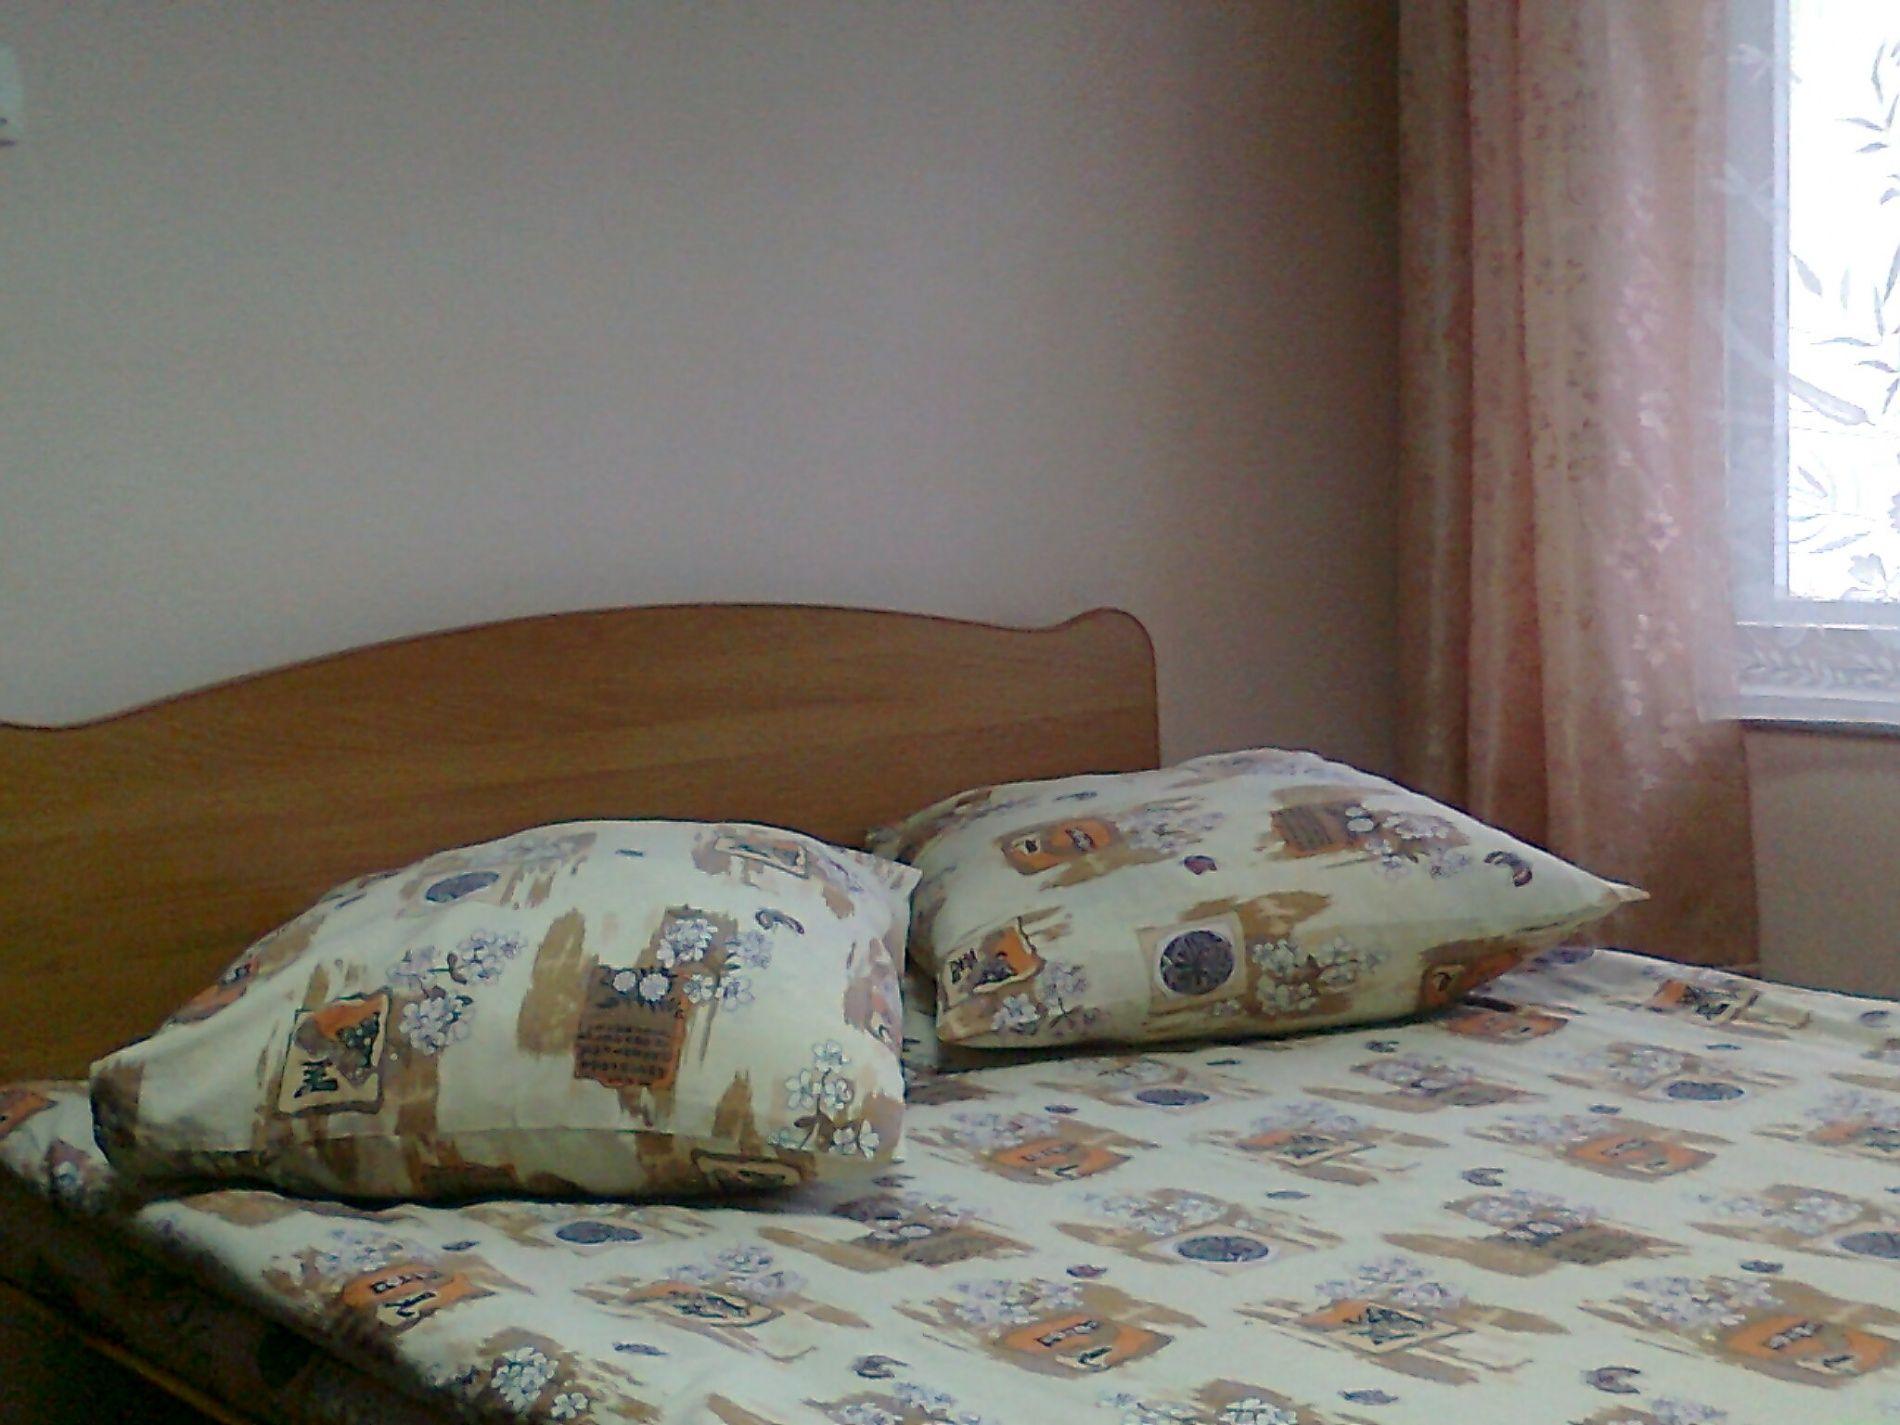 База отдыха «Афродита» Приморский край 2-местный номер на 1 эт., фото 2